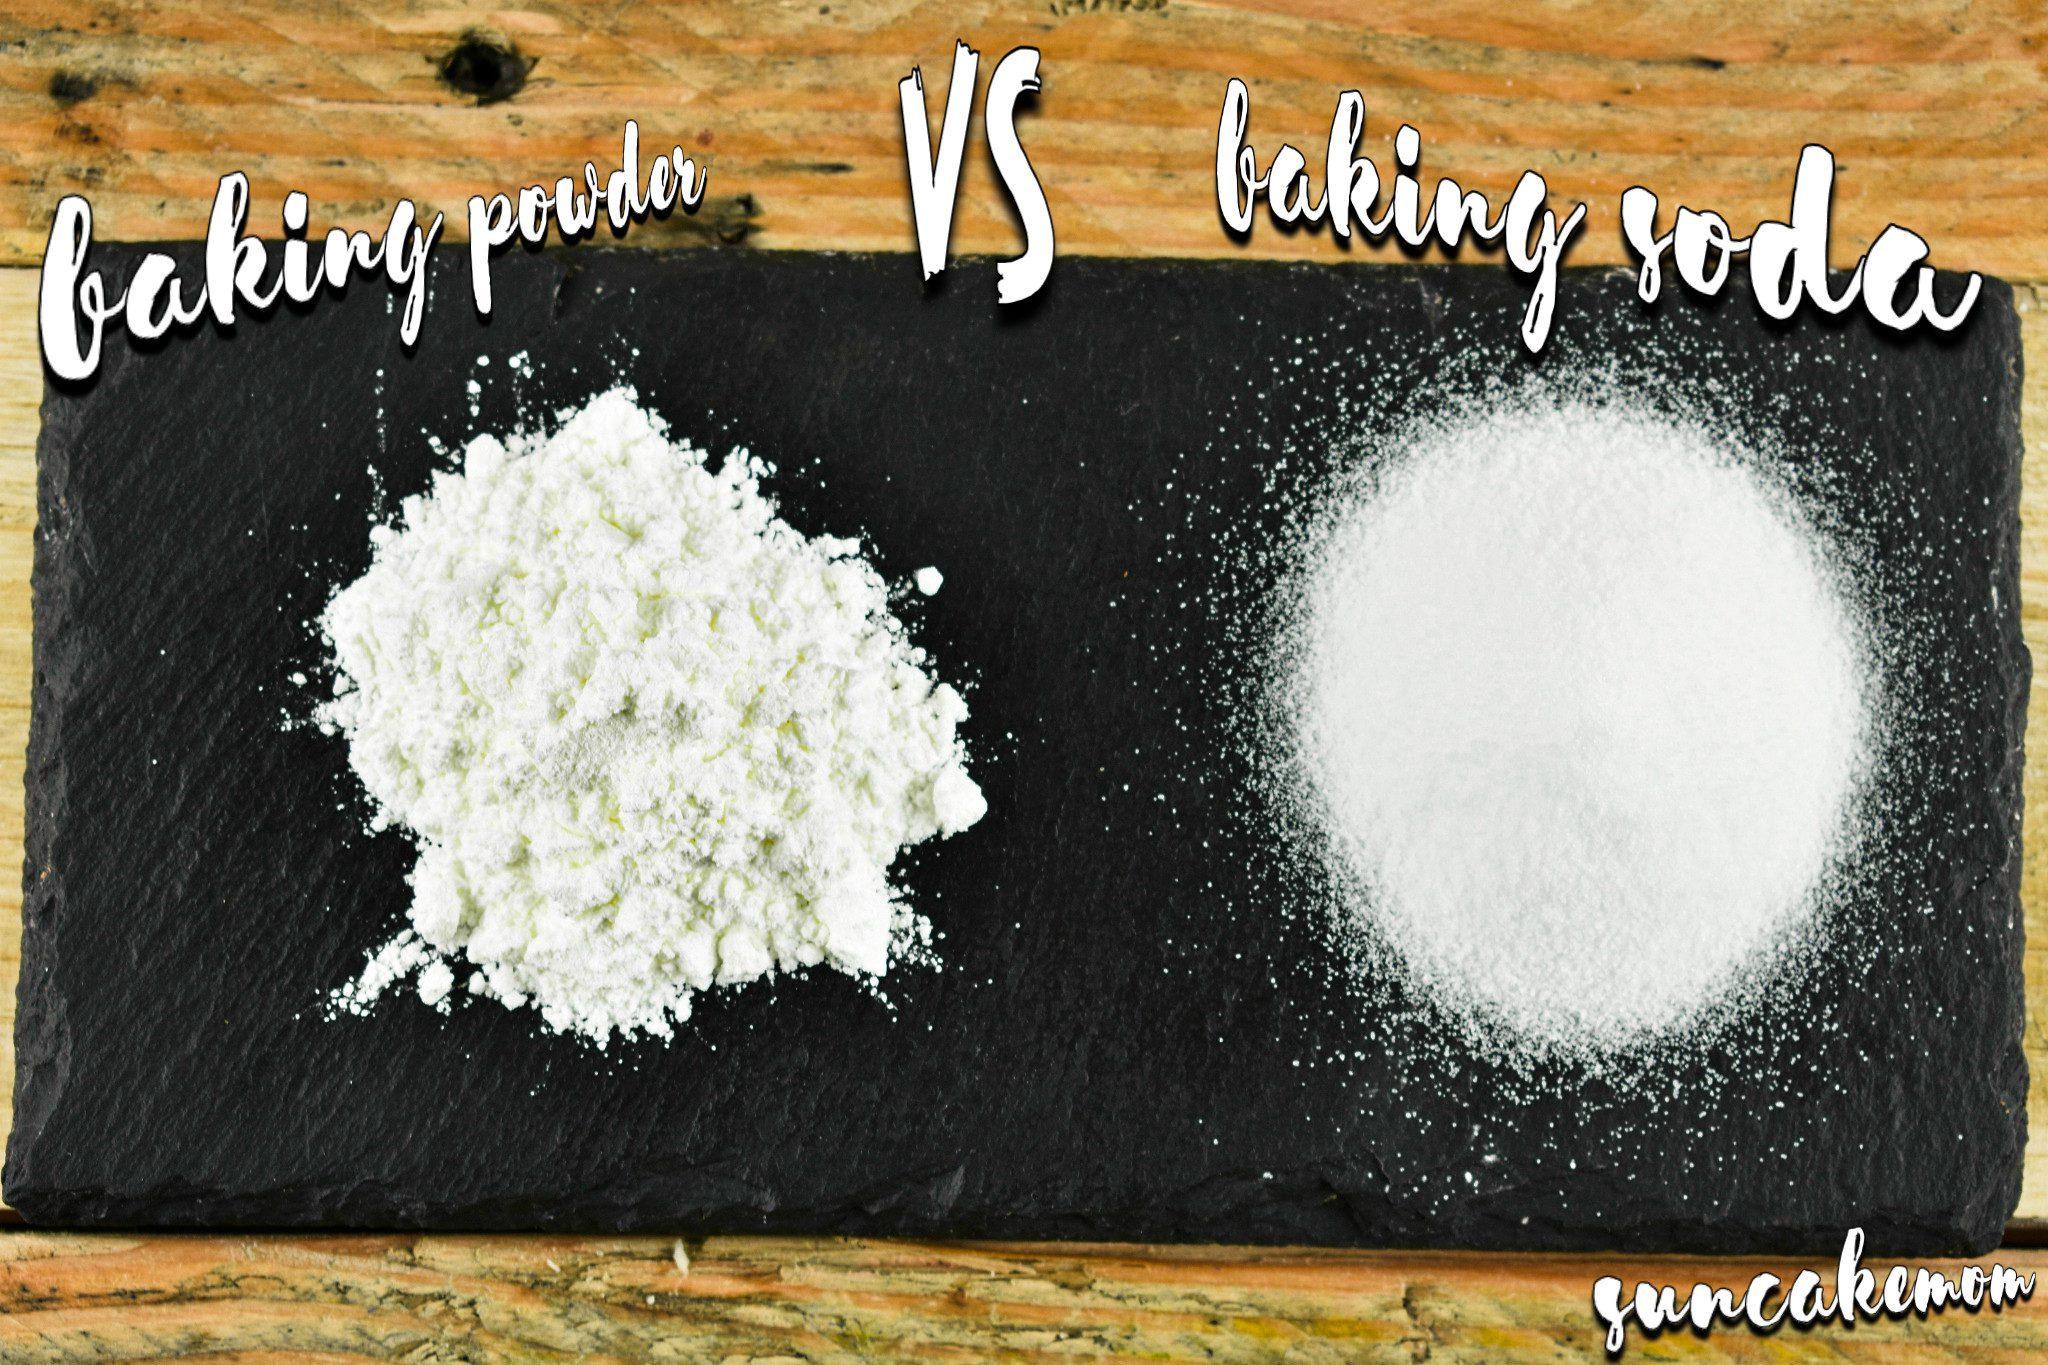 Baking-powder-vs-baking-soda-1-SunCakeMOm